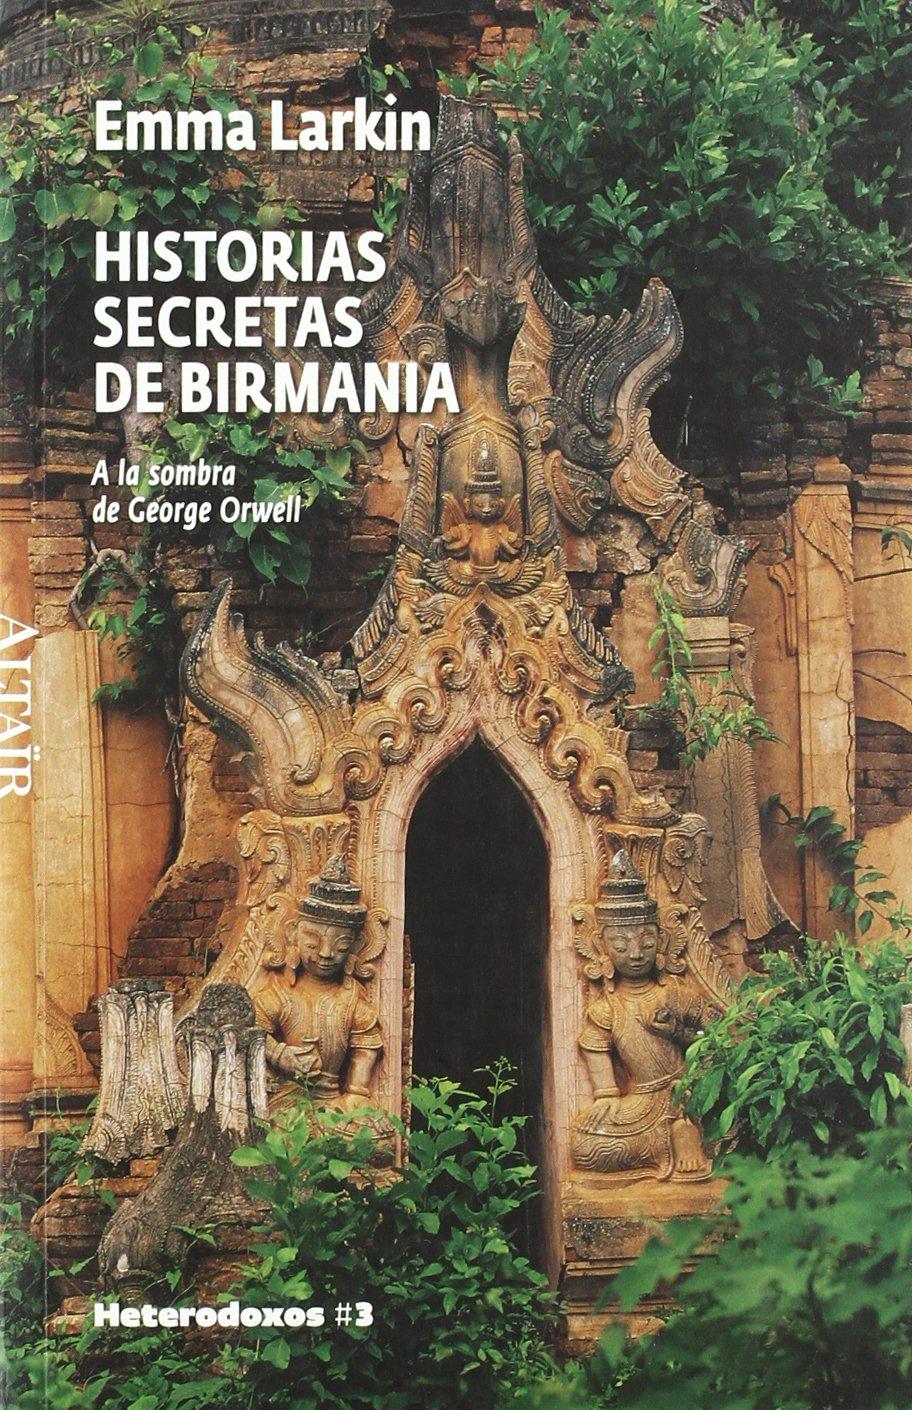 Historias secretas de Birmania: A la sombra de George Orwell (HETERODOXOS) Tapa blanda – Versión íntegra, 1 nov 2008 Emma Larkin Mireia Terés Loriente ALTAIR 8493622028